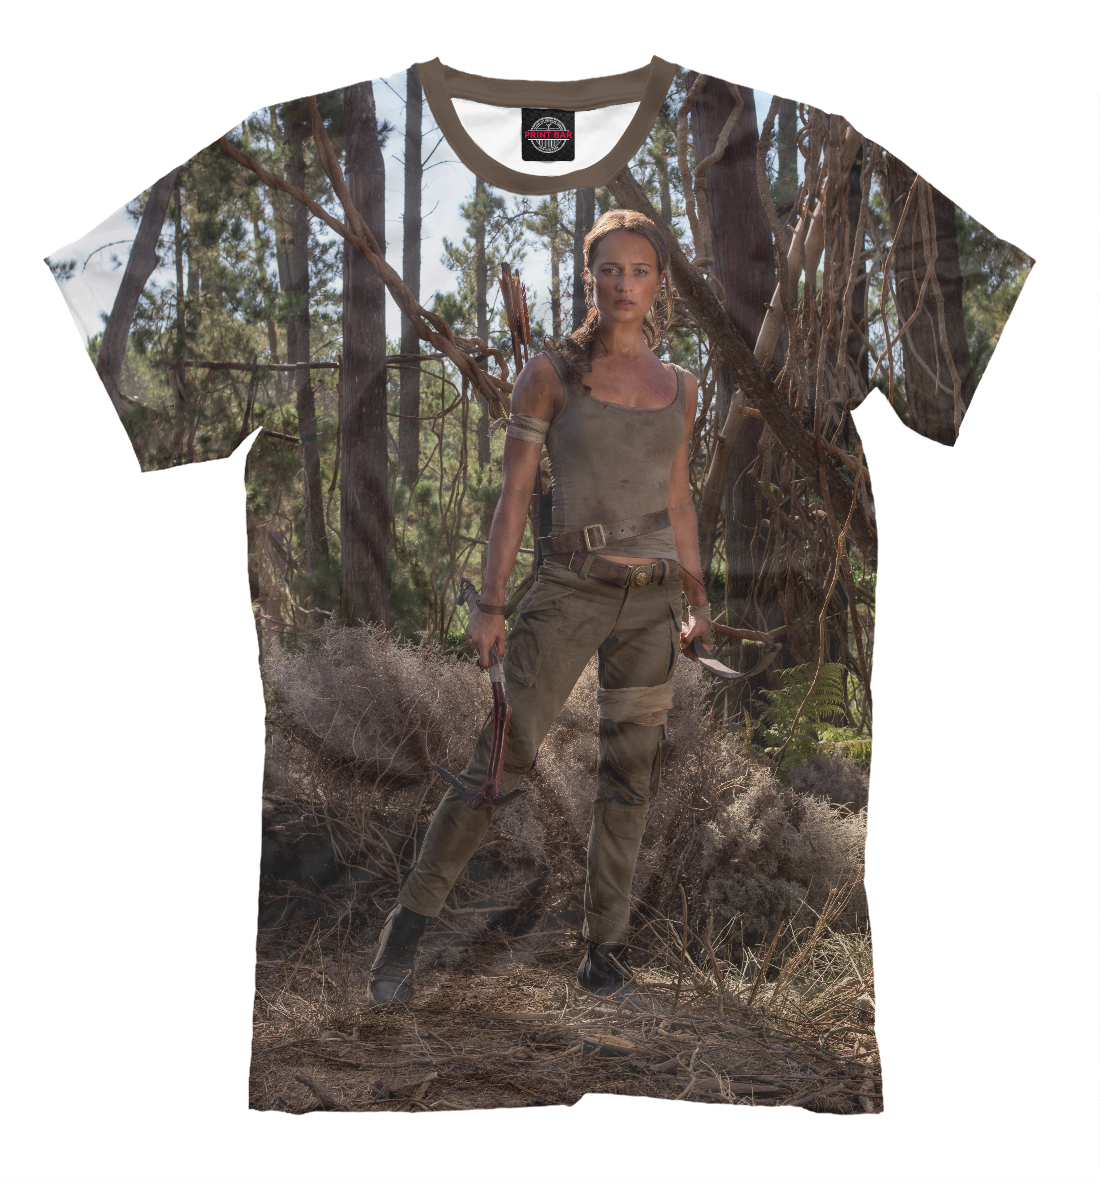 Купить Tomb Raider, Printbar, Футболки, KNO-658921-fut-2